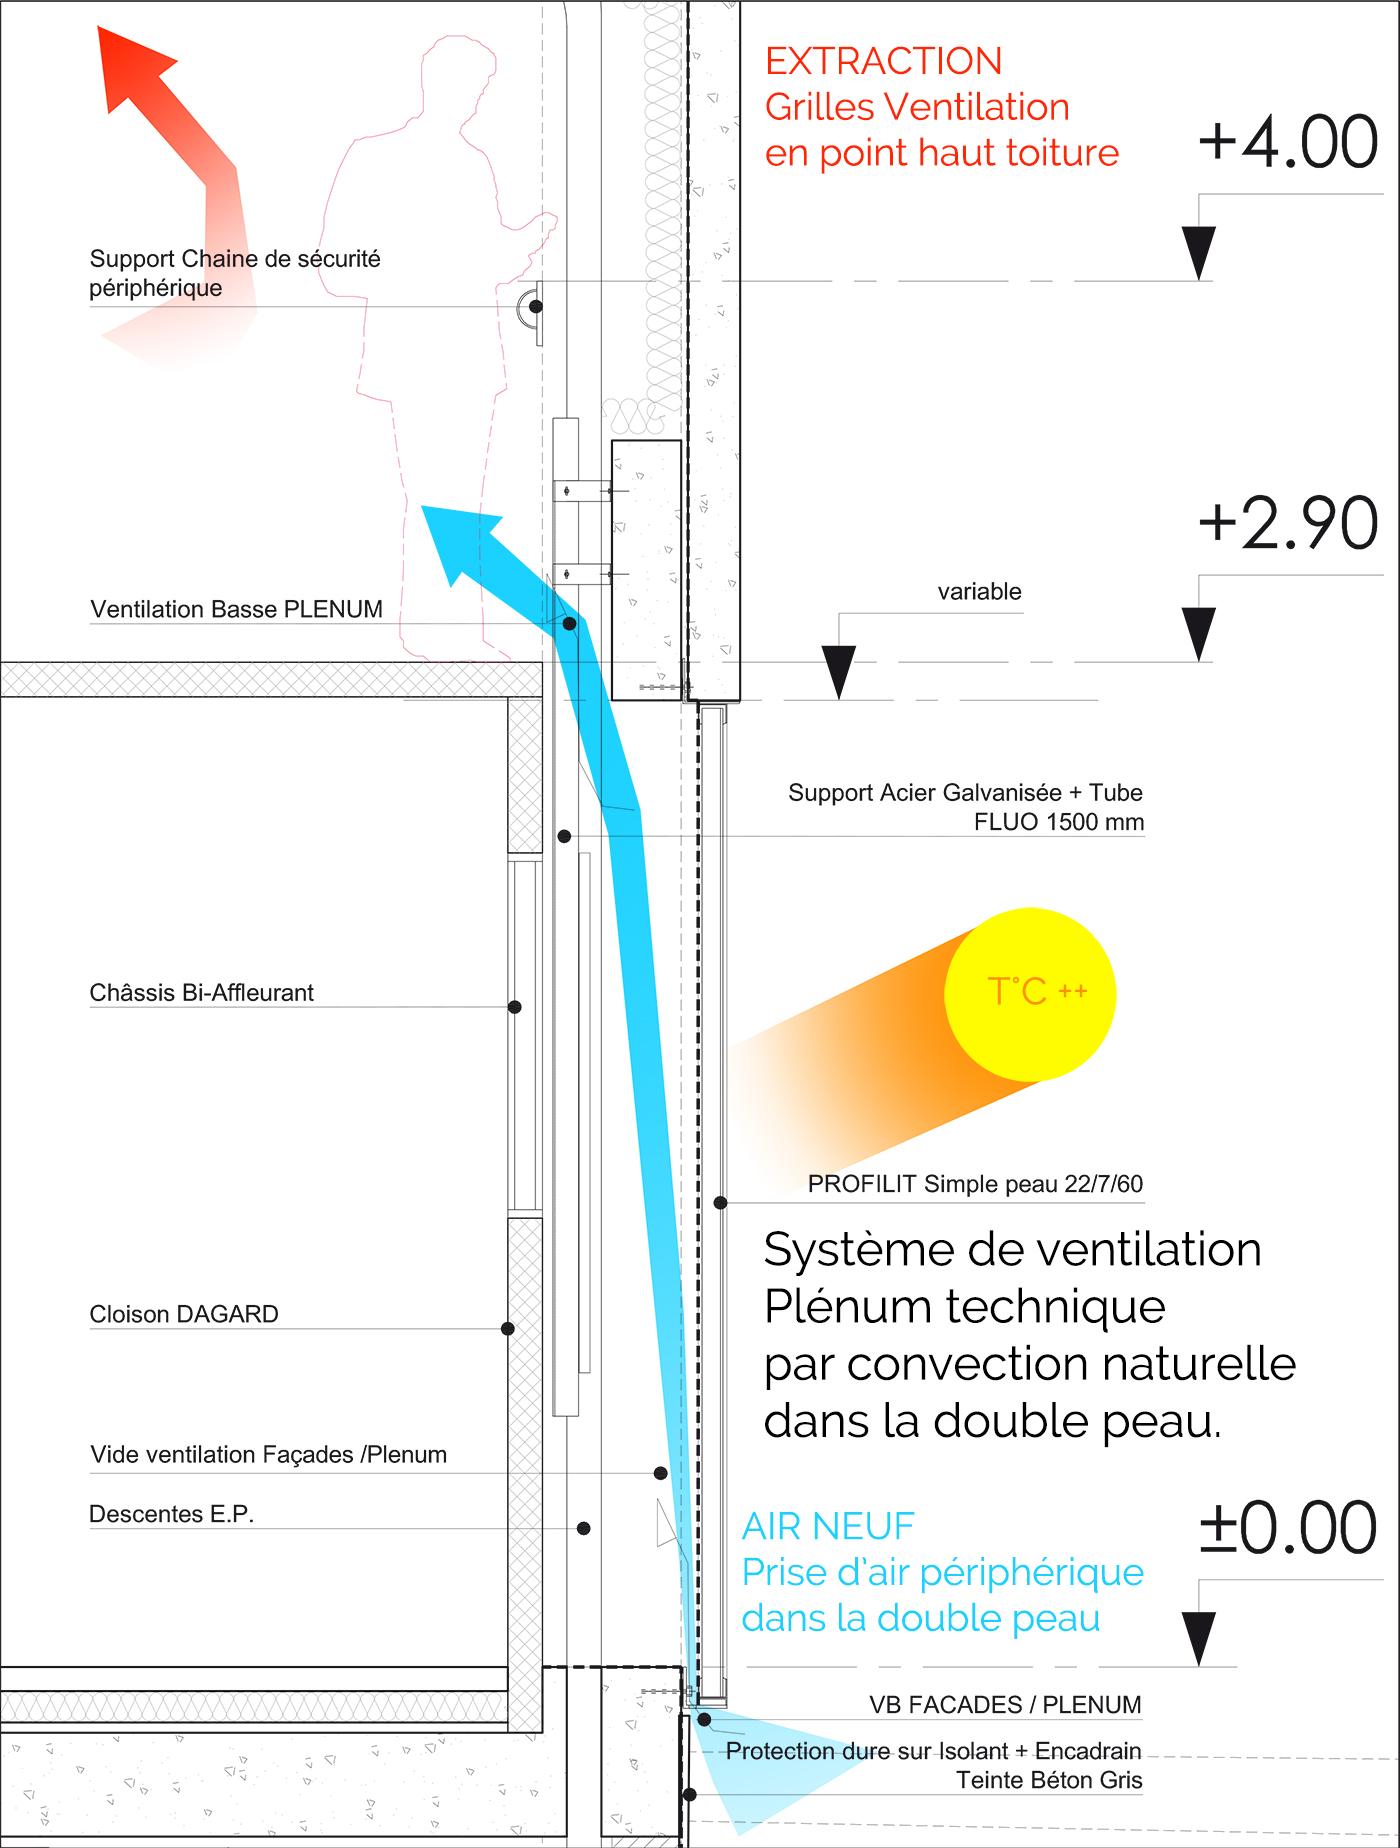 23-CC-VDL-phase PRO-150604 23-carnet details.pdf